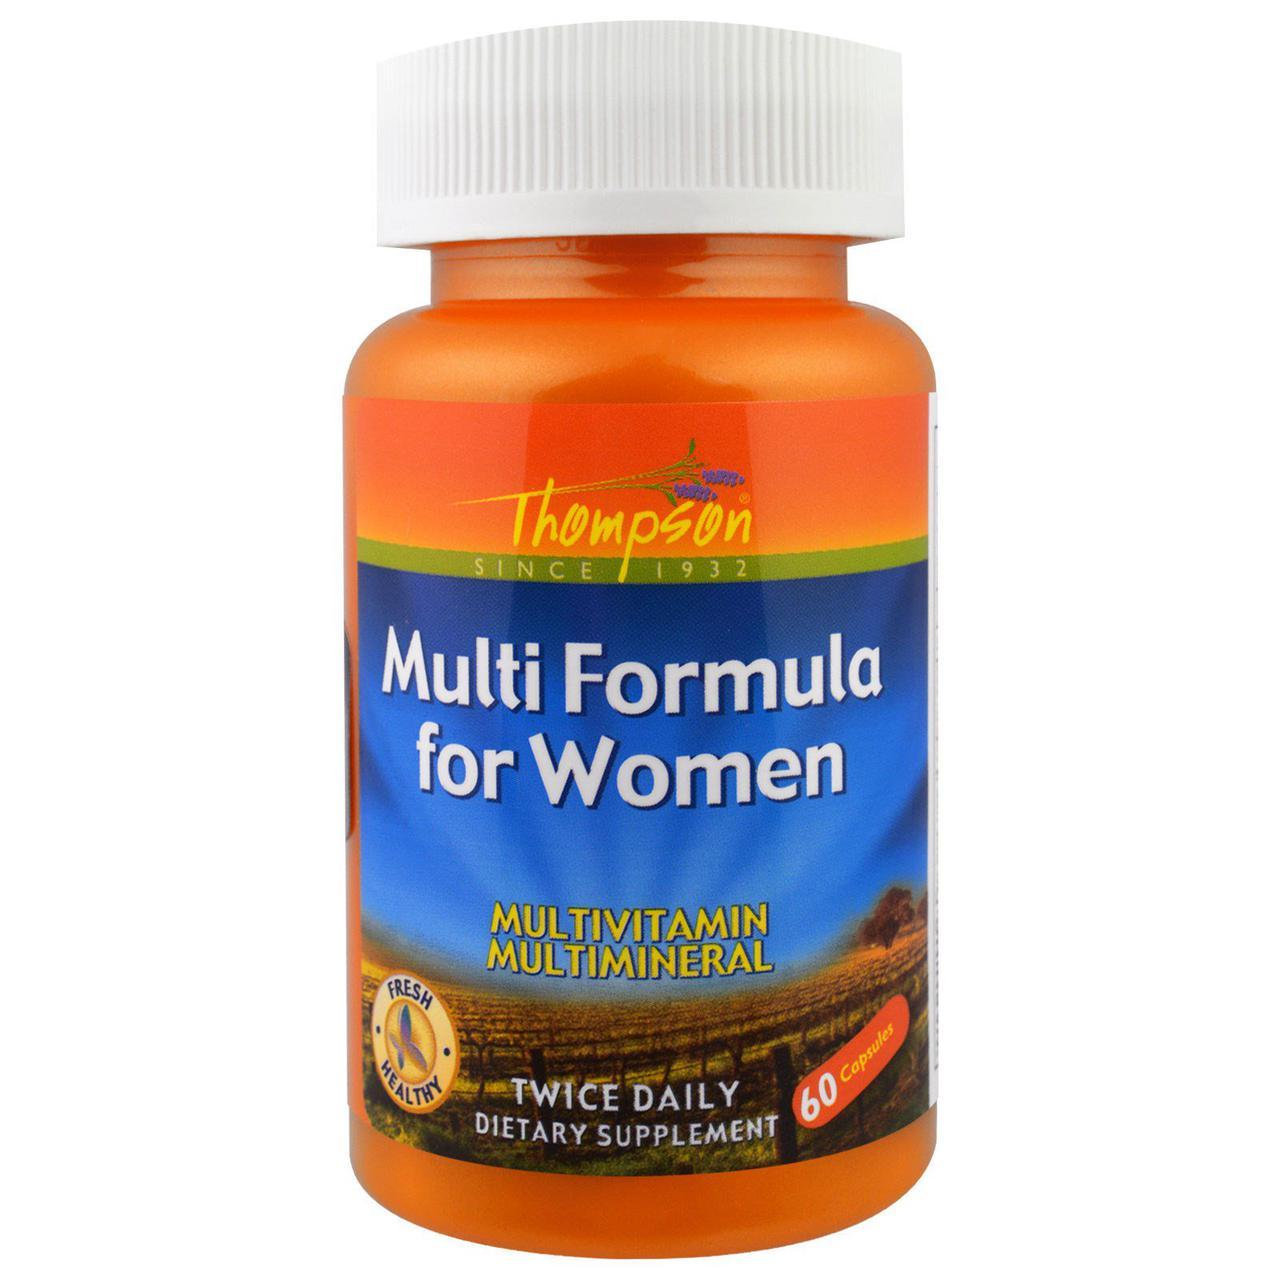 Витамины для женщин Thompson Multi Formula for Women 60 капс на 30 дней